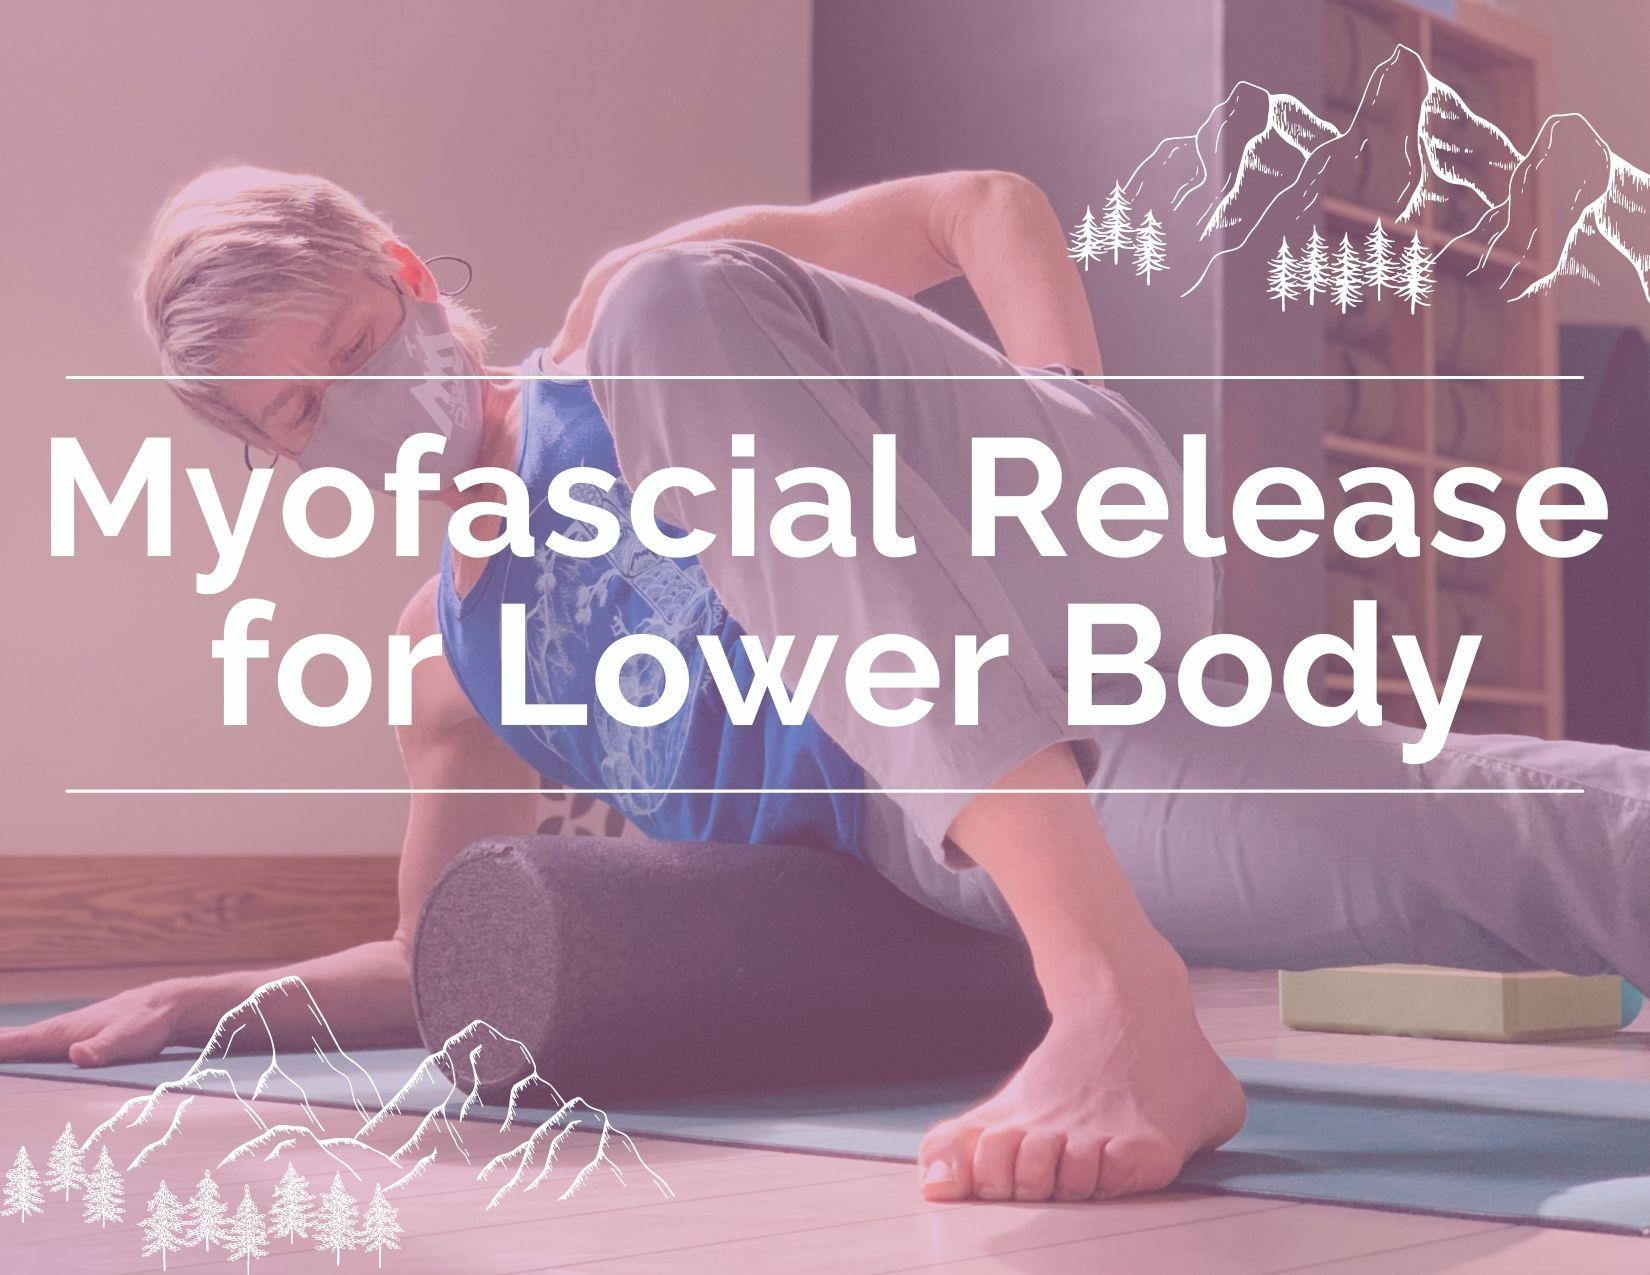 Lower Body Myofascial